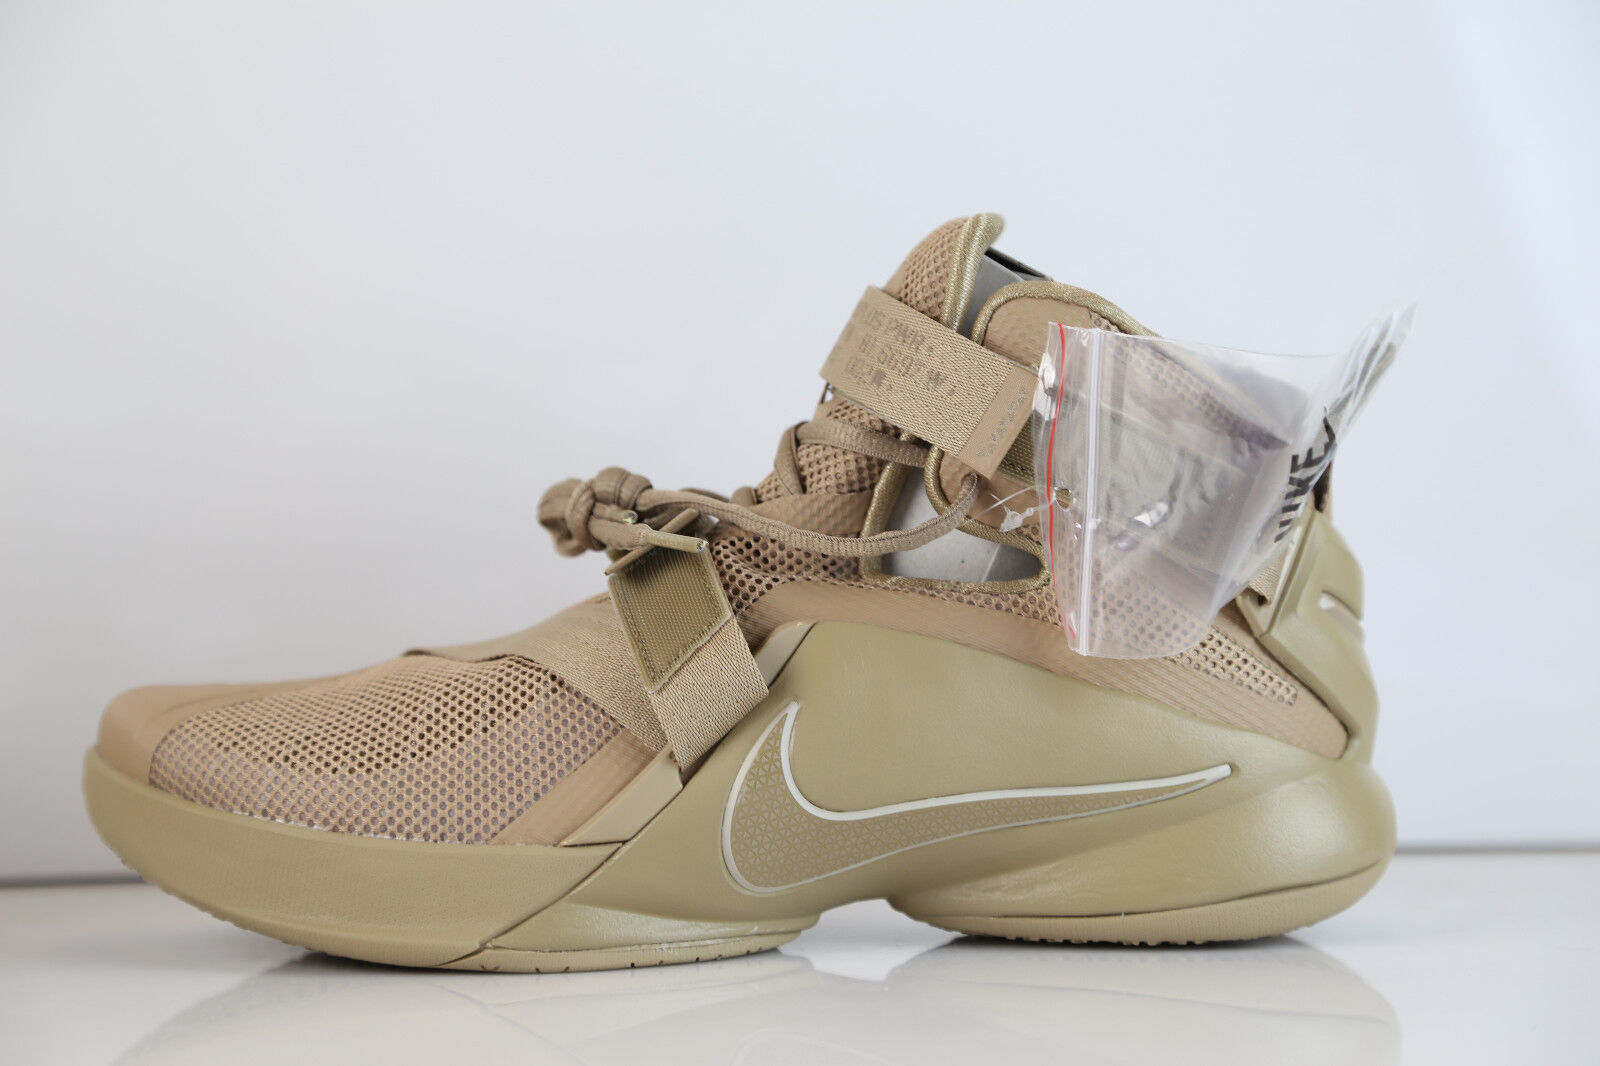 Nike Zoom Lebron Soldier IX Prm Desert Camo 749490-222 8-12.5 9 premium m13 11